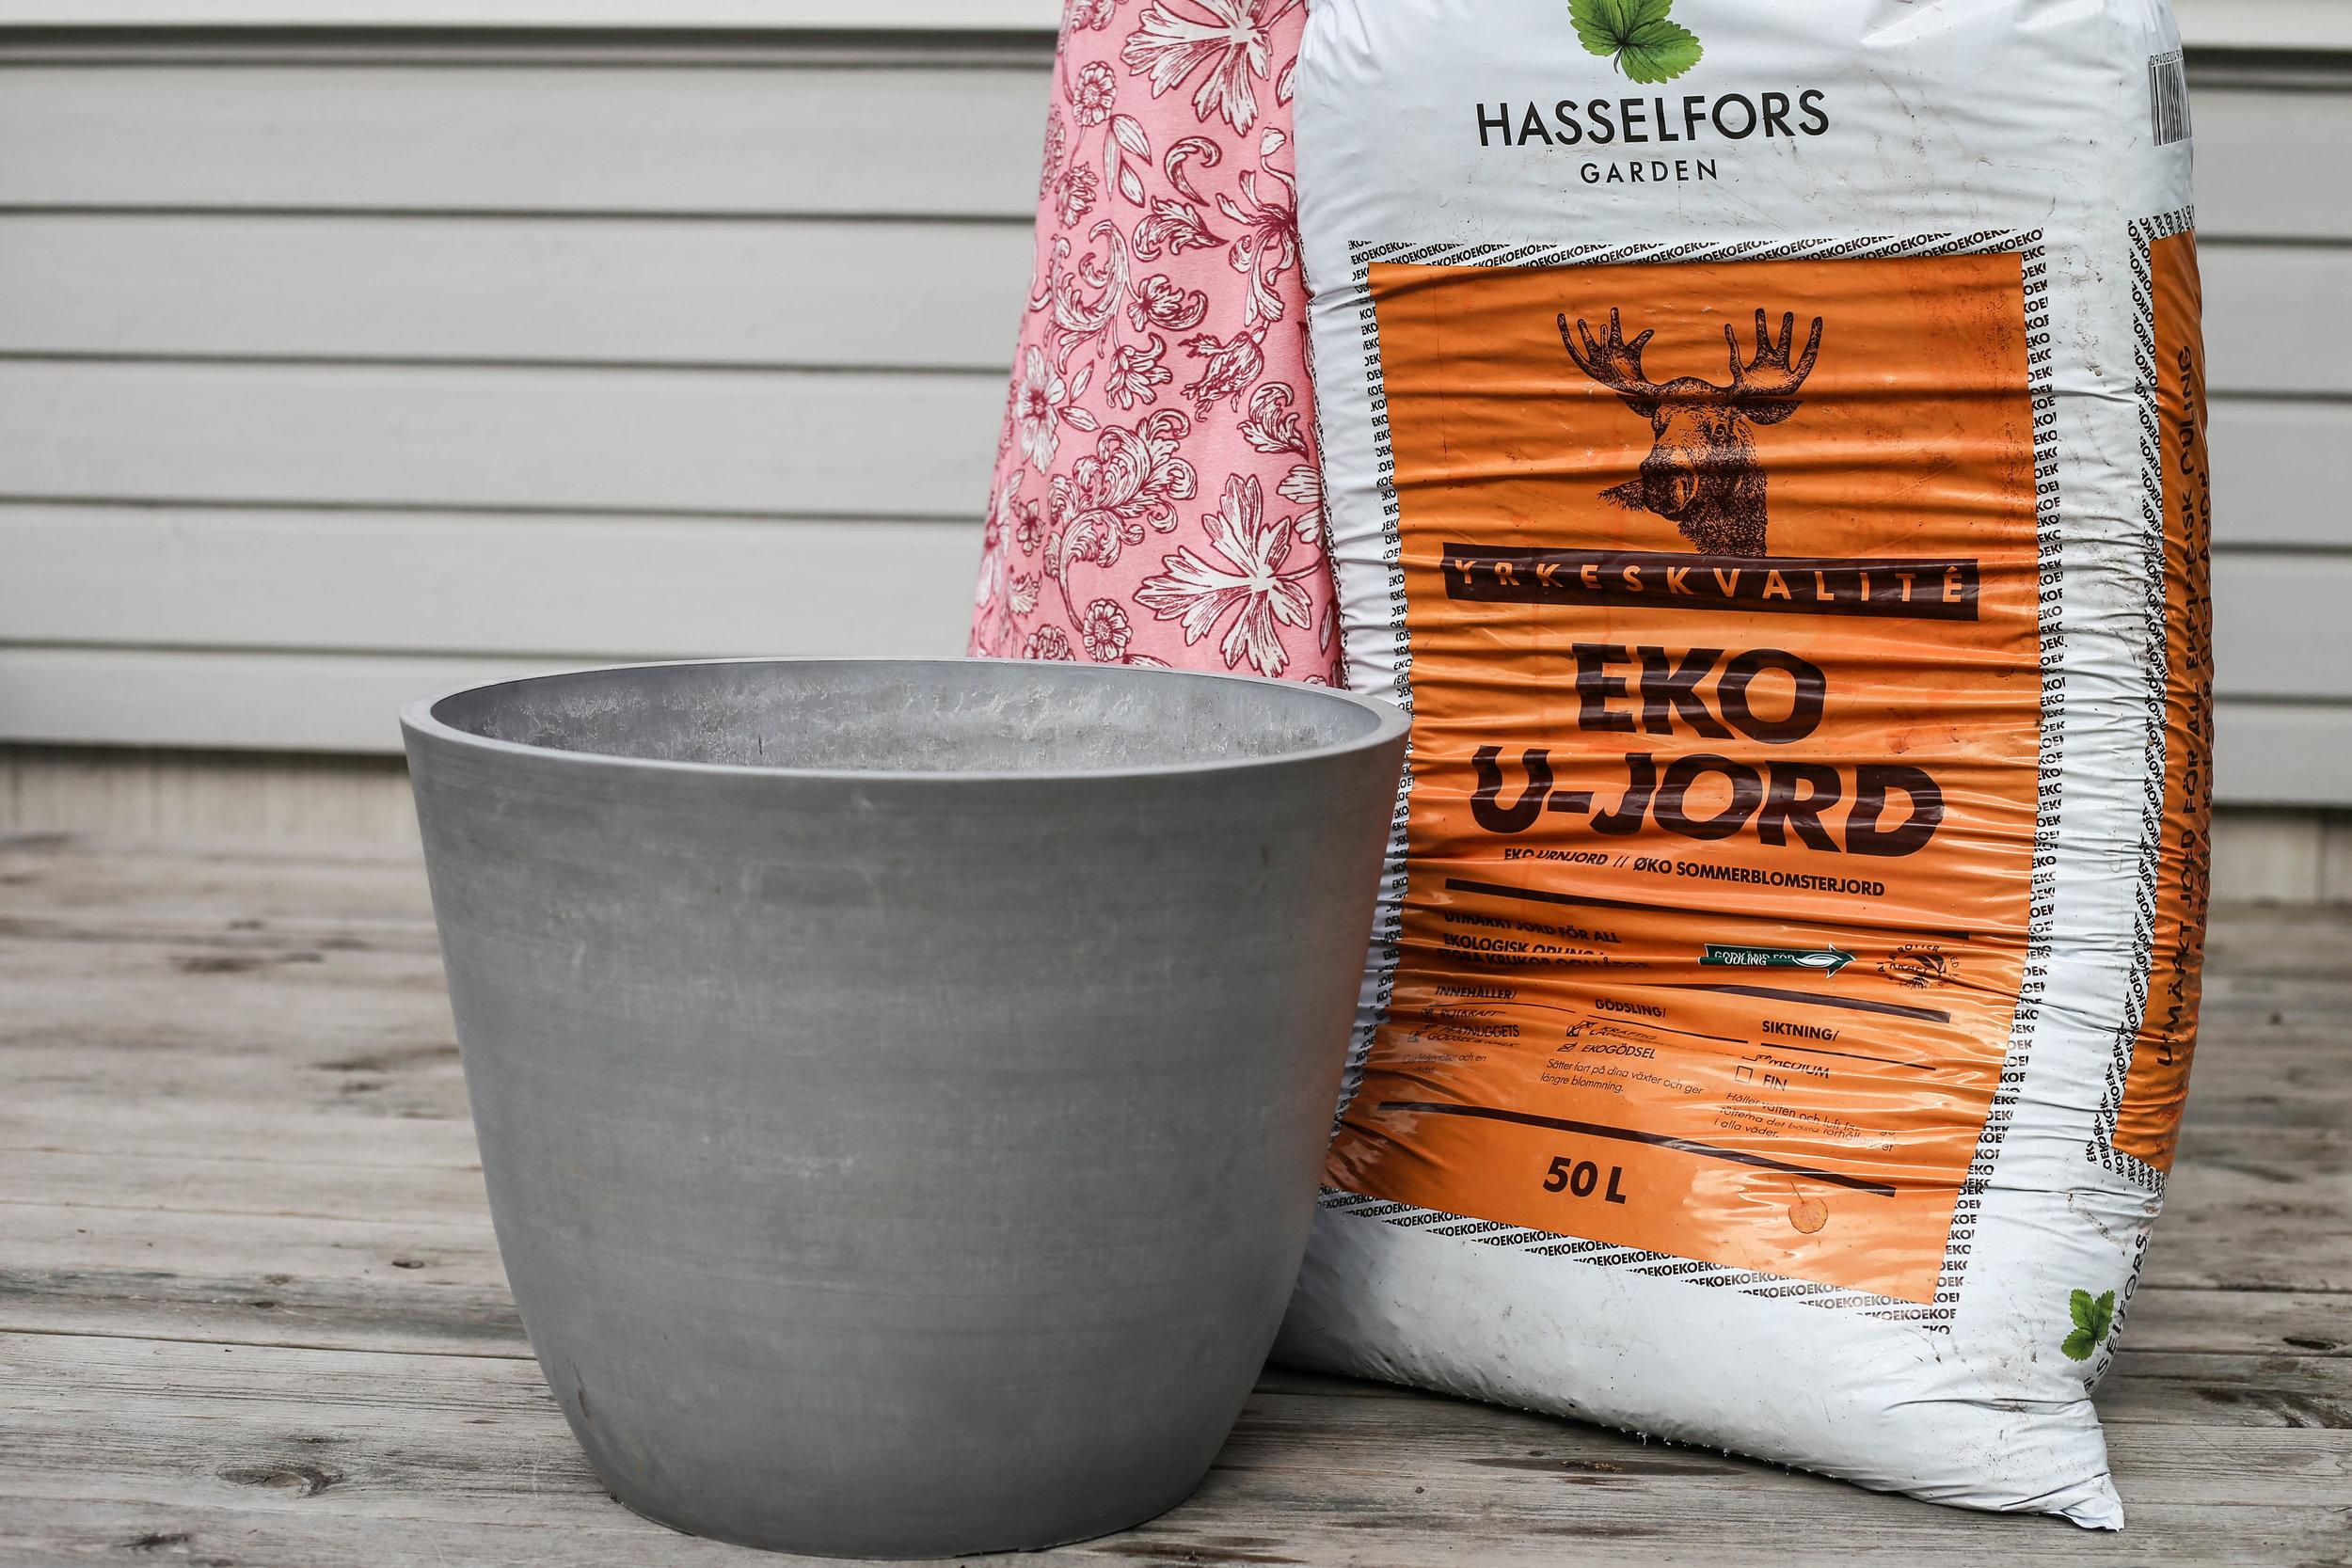 Hasselfors_HannaWendelbo_trädgård-2.jpg